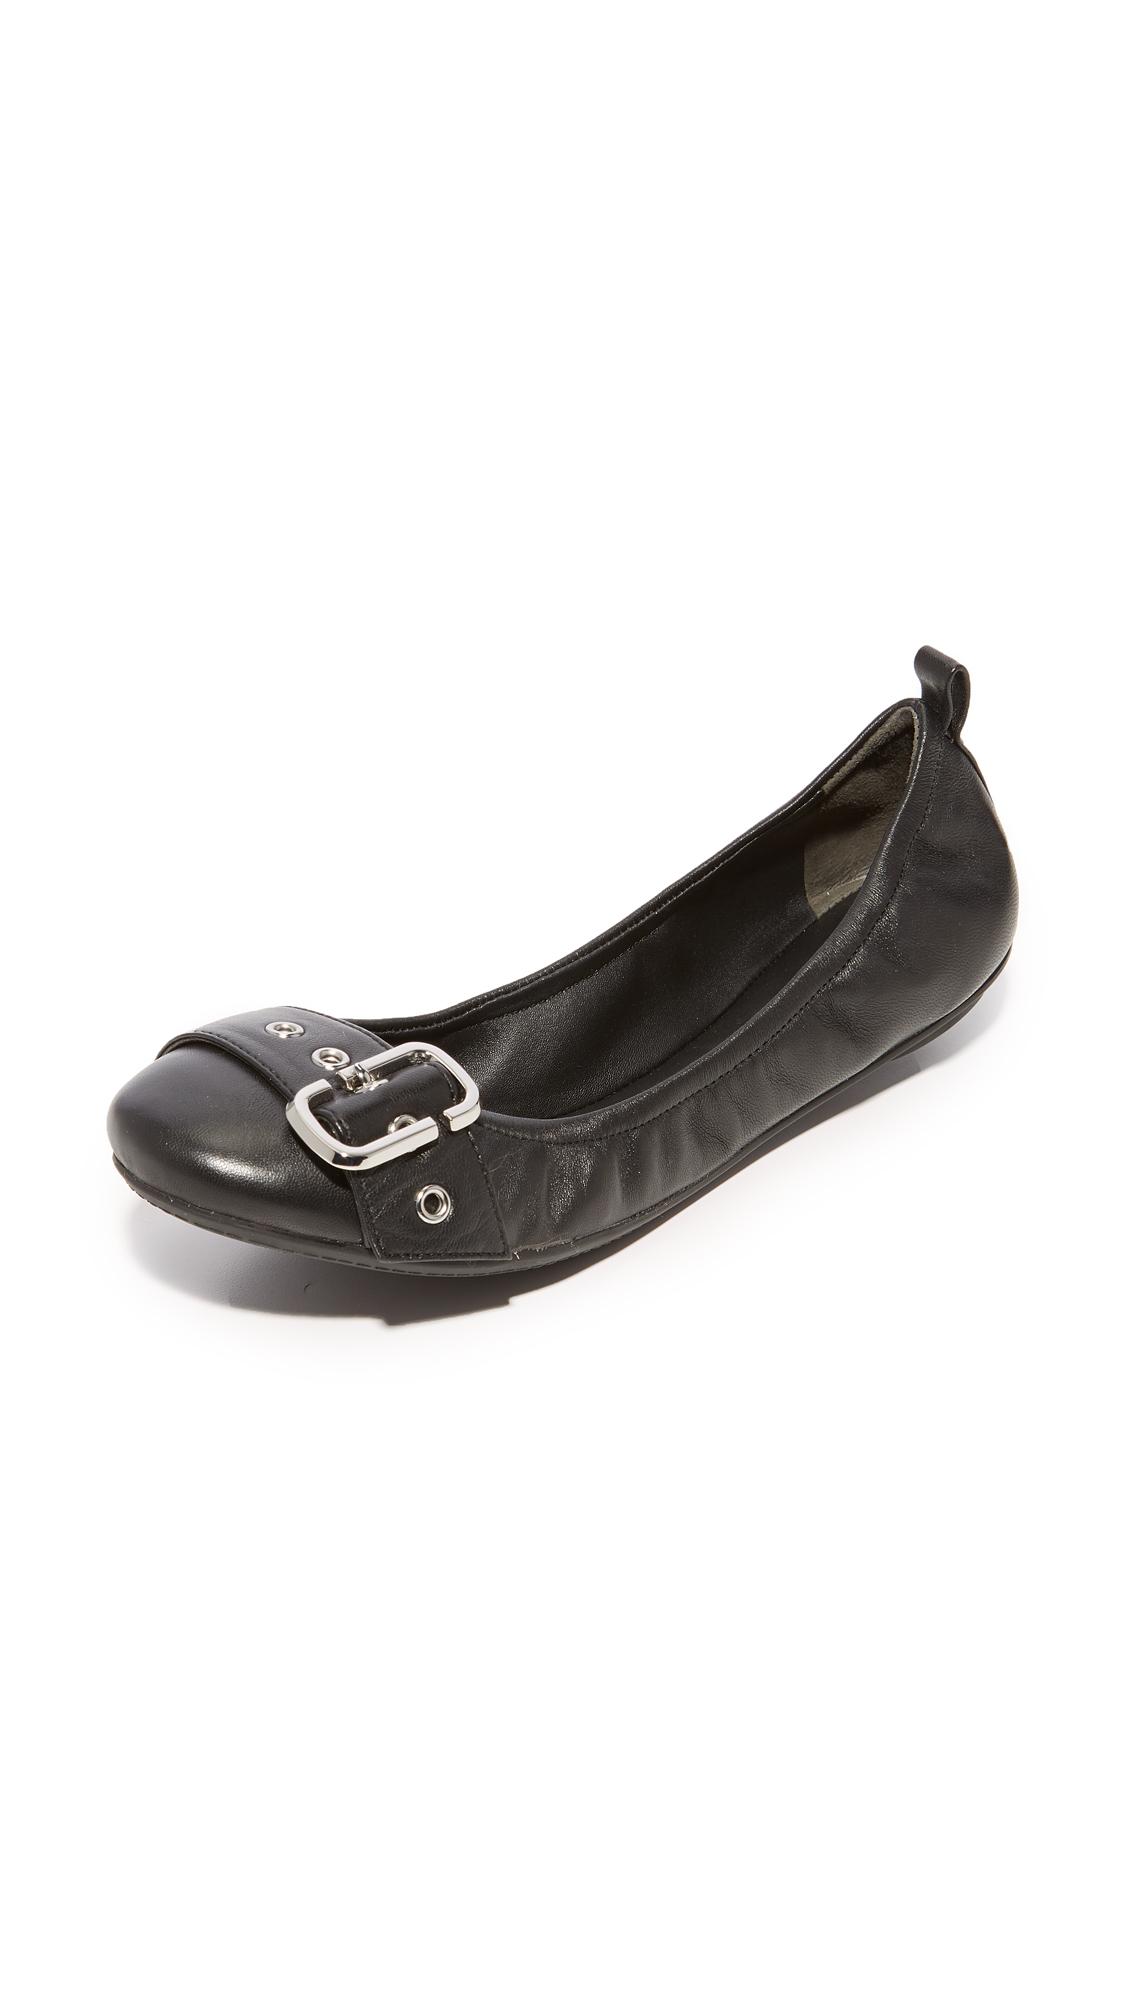 Marc Jacobs Dolly Buckle Ballerina Flats - Black